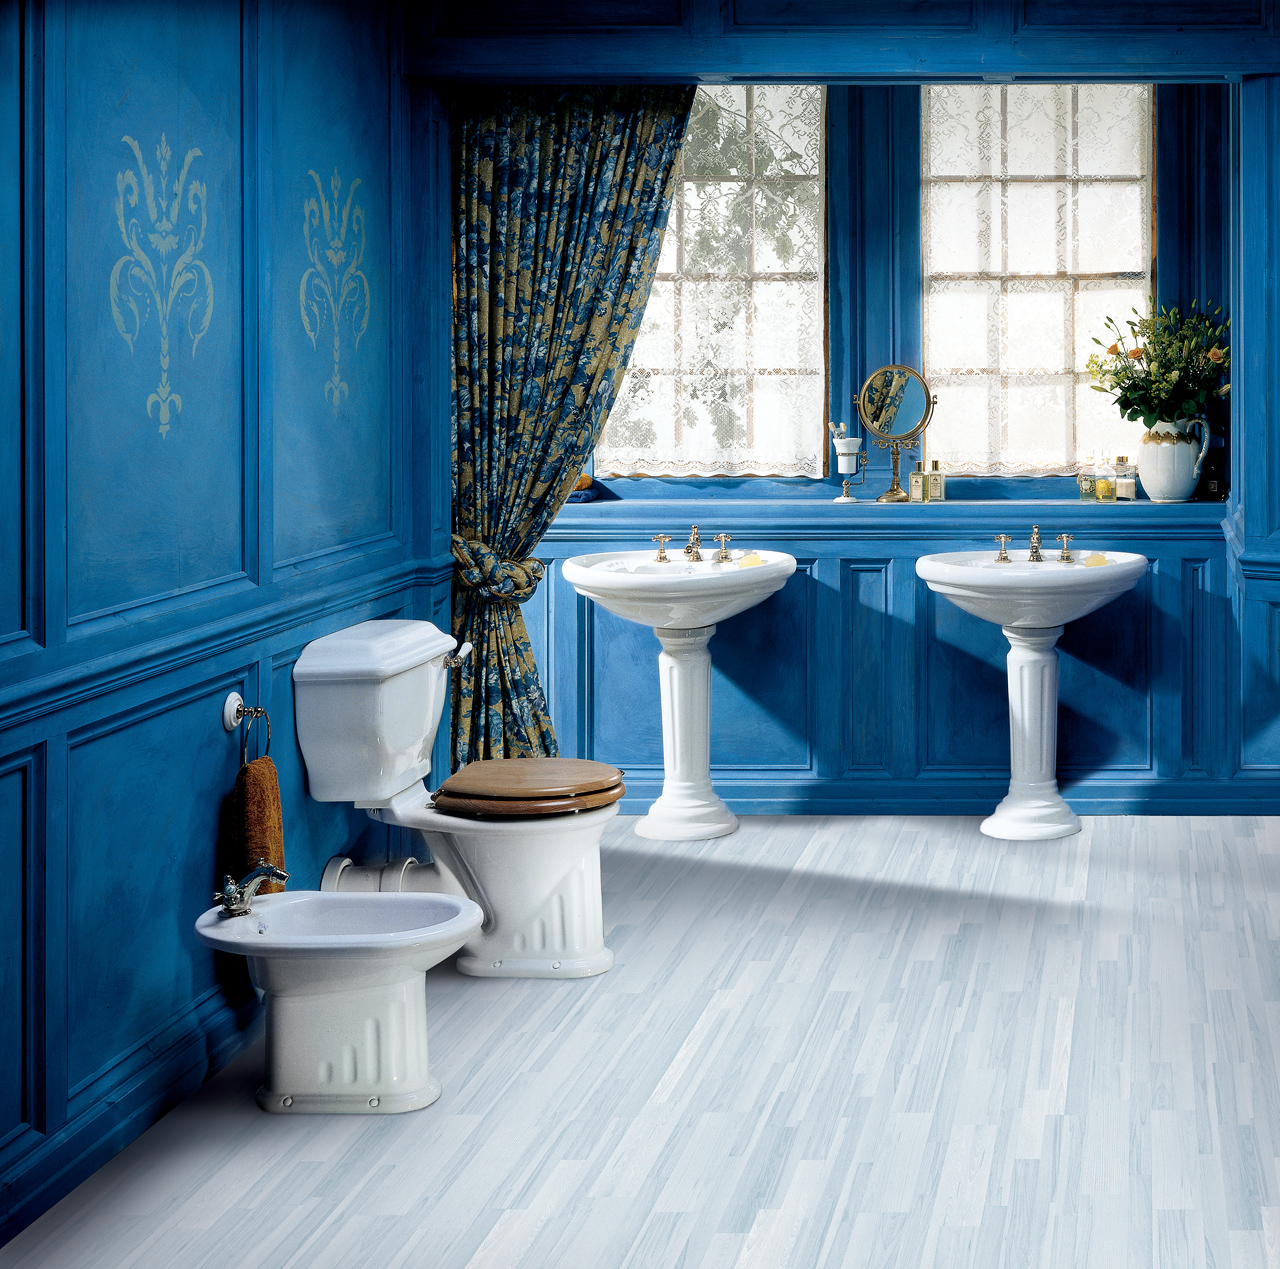 Classic Bathrooms: Imperial Bathrooms - Windsor-Main-picture